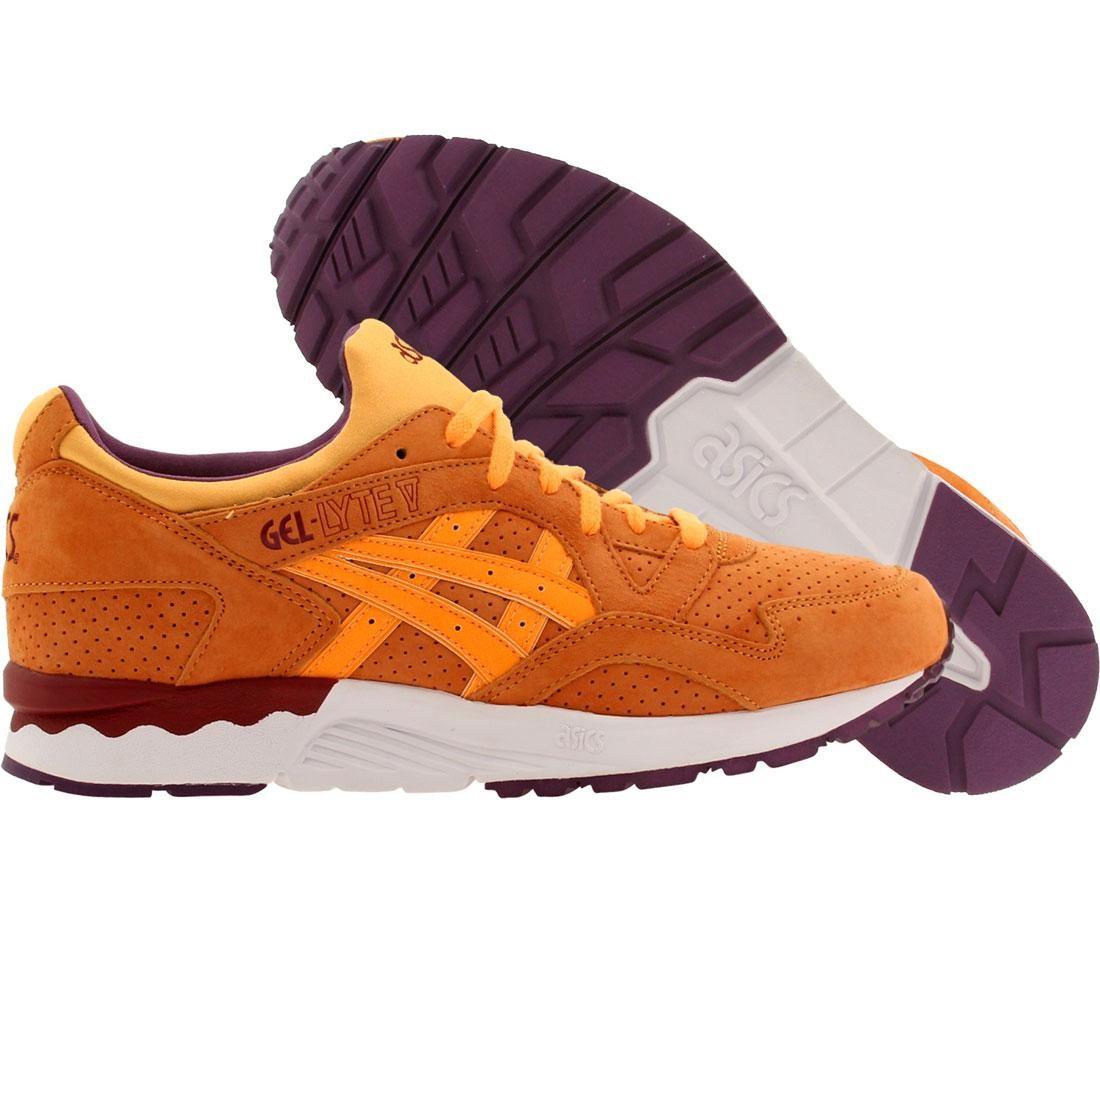 Buy asics gel lyte v orange > Up to OFF76% Discounted